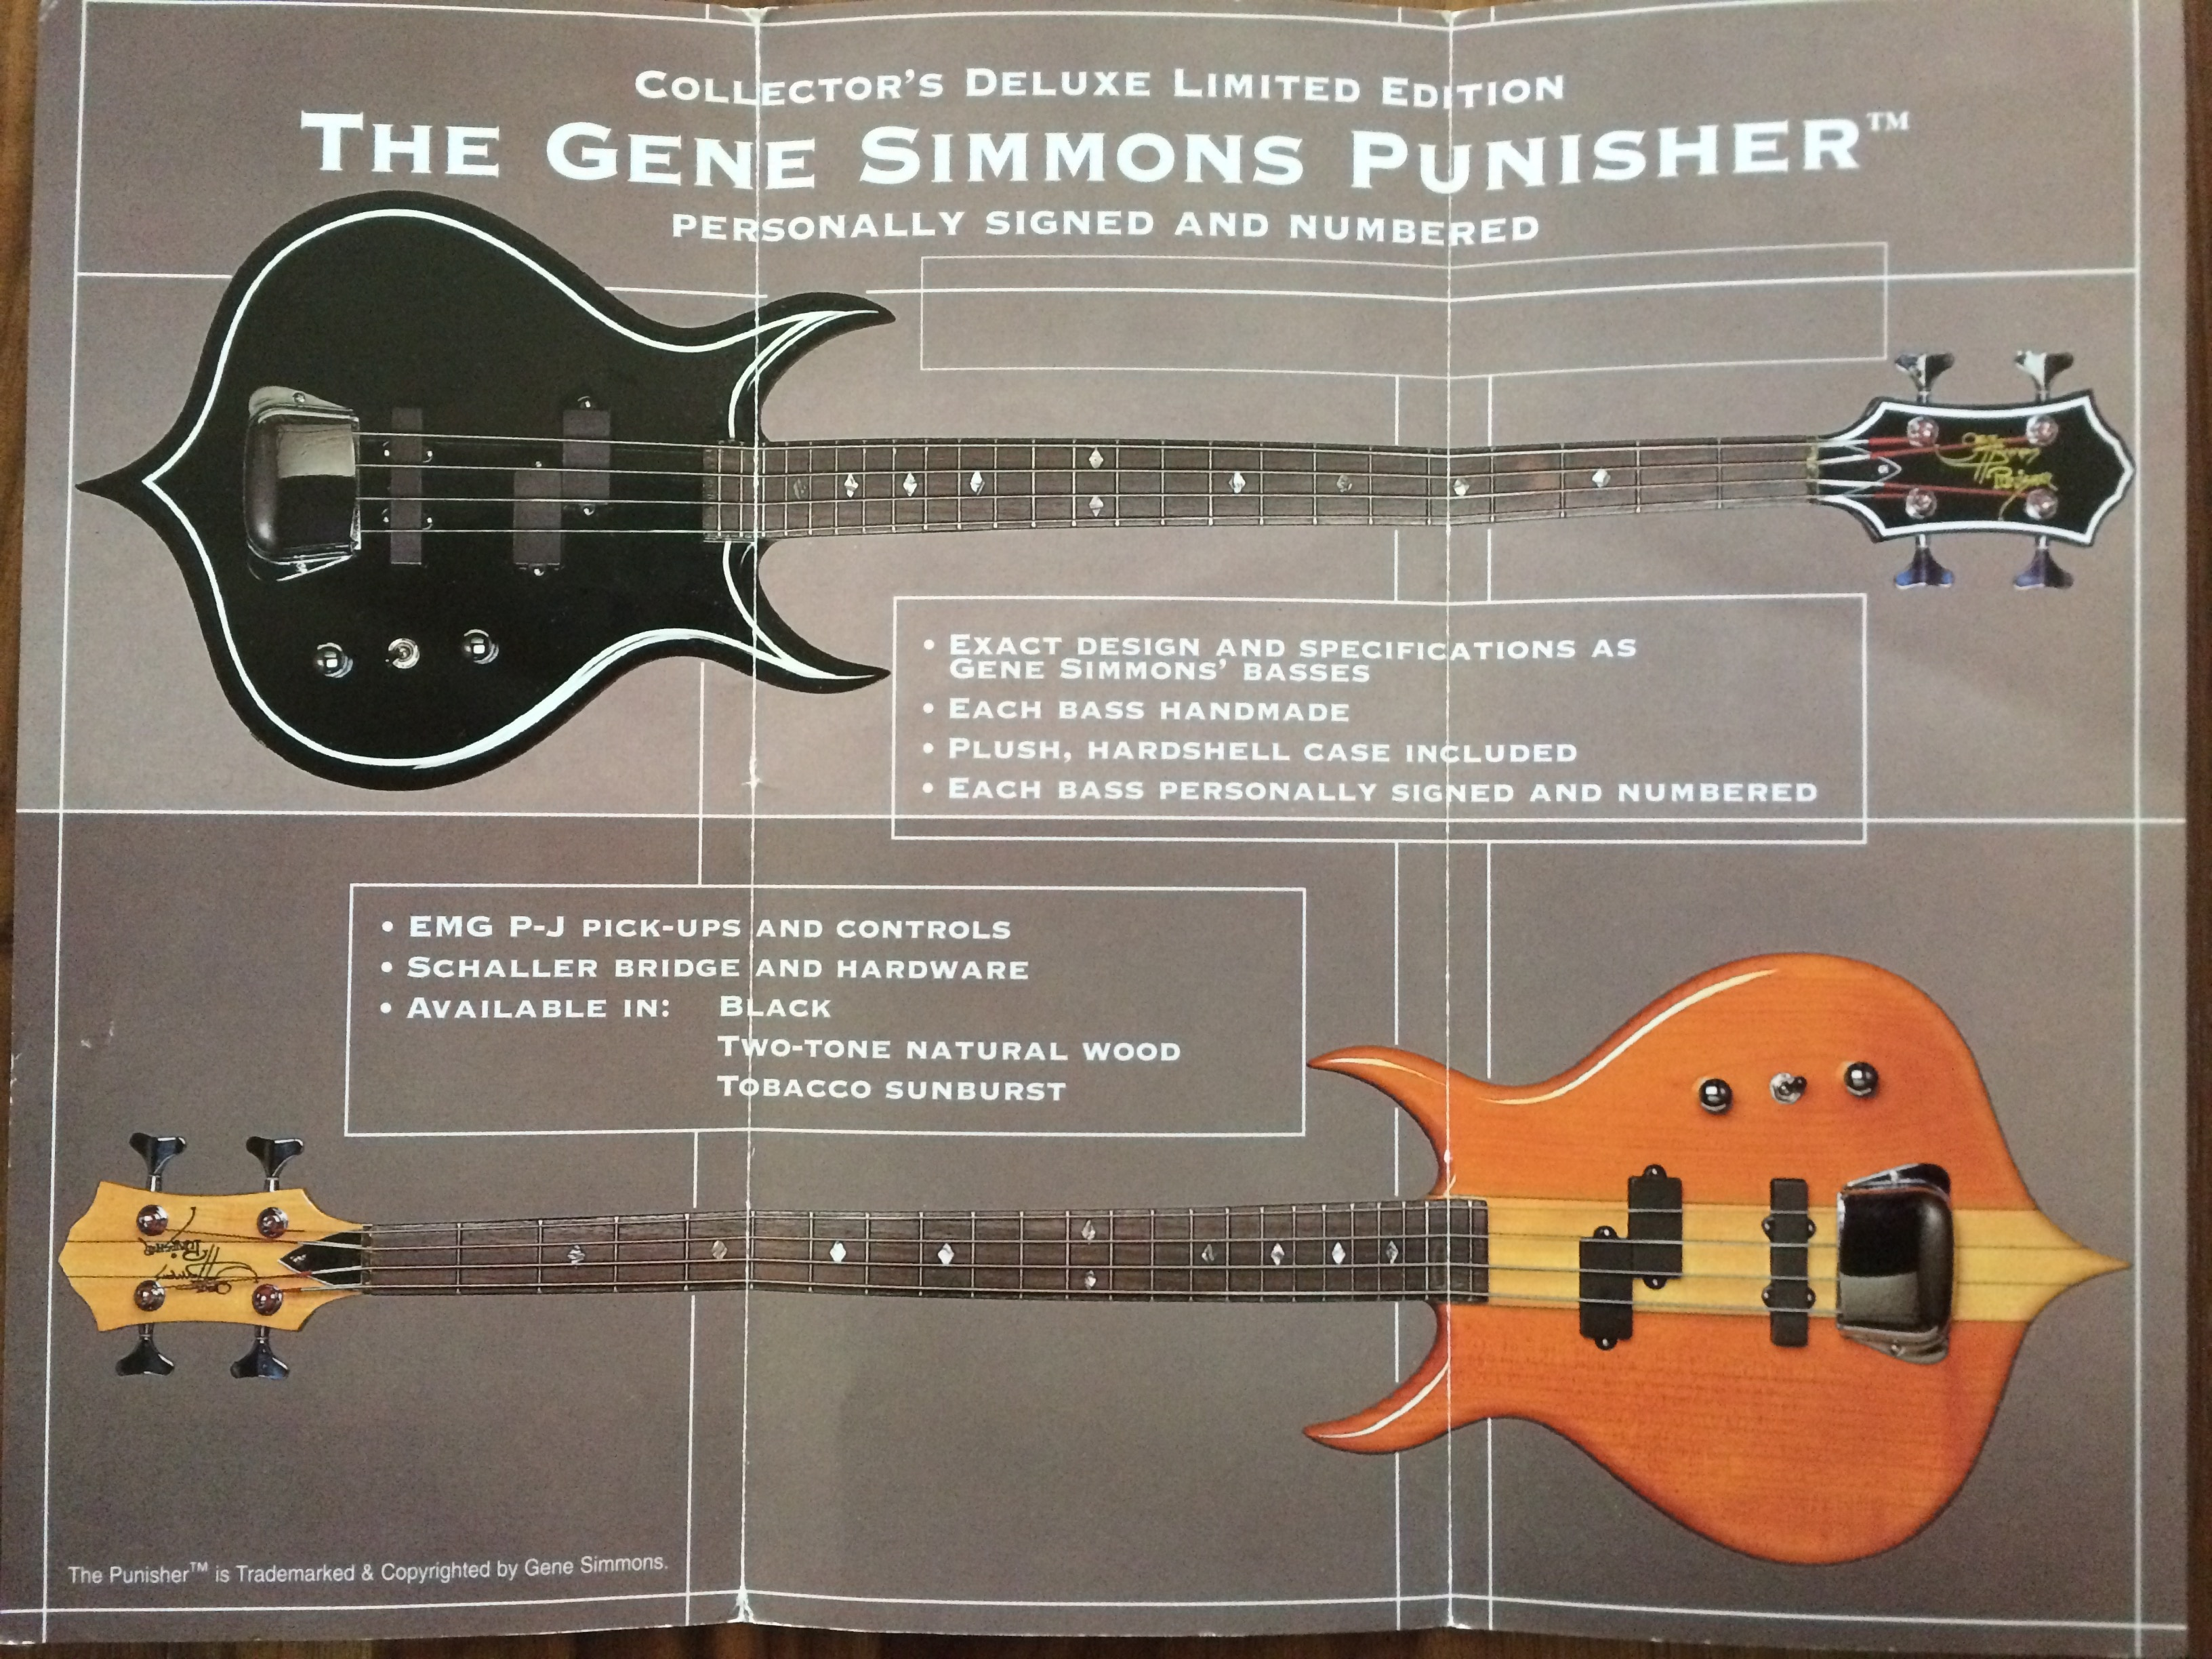 Original Verkaufsprospekt von Gene Simmons Punischer Bass.